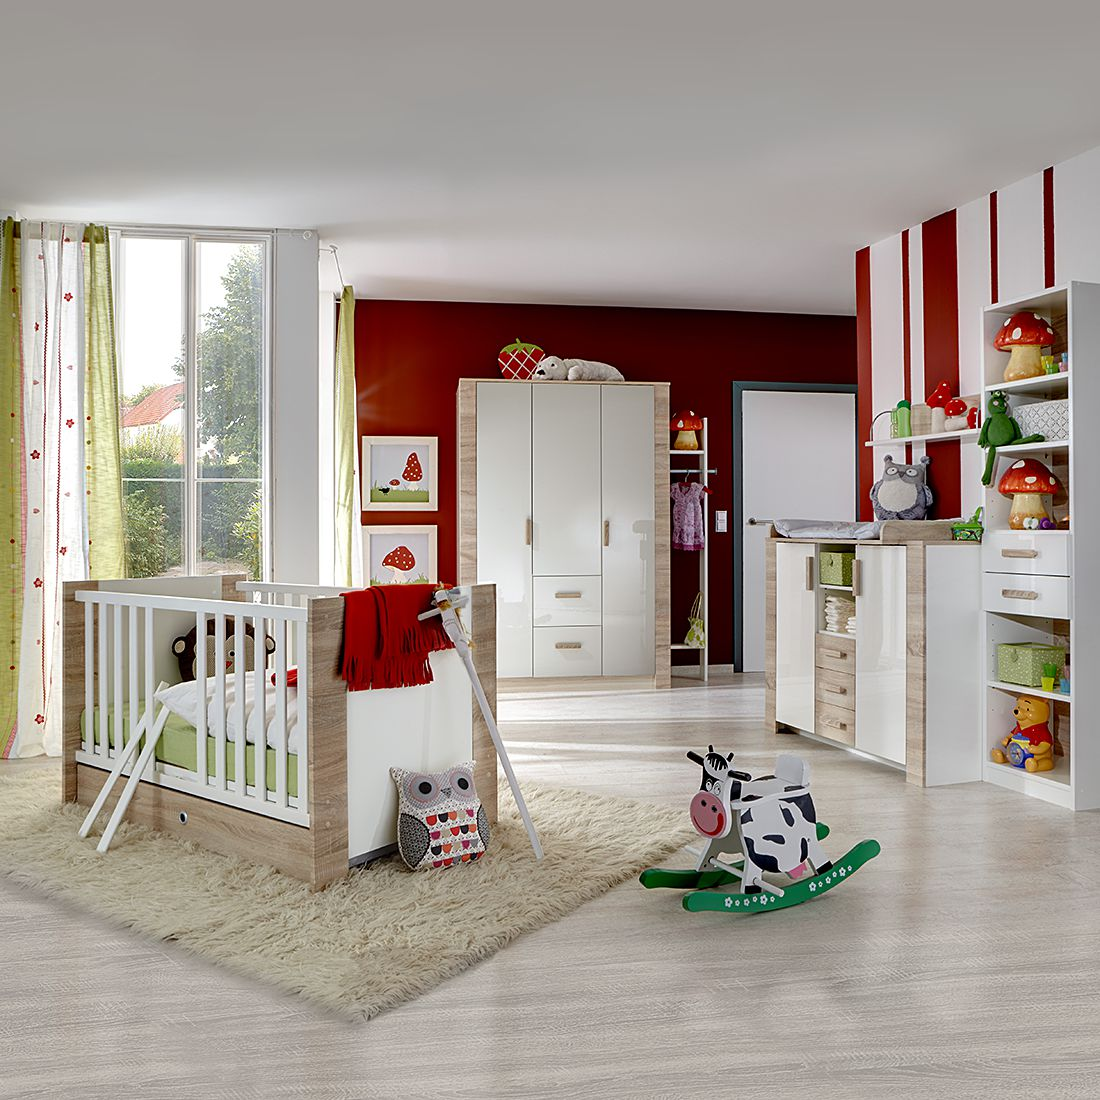 20170118203523 landhaus schlafzimmer komplett ~ easinext.com